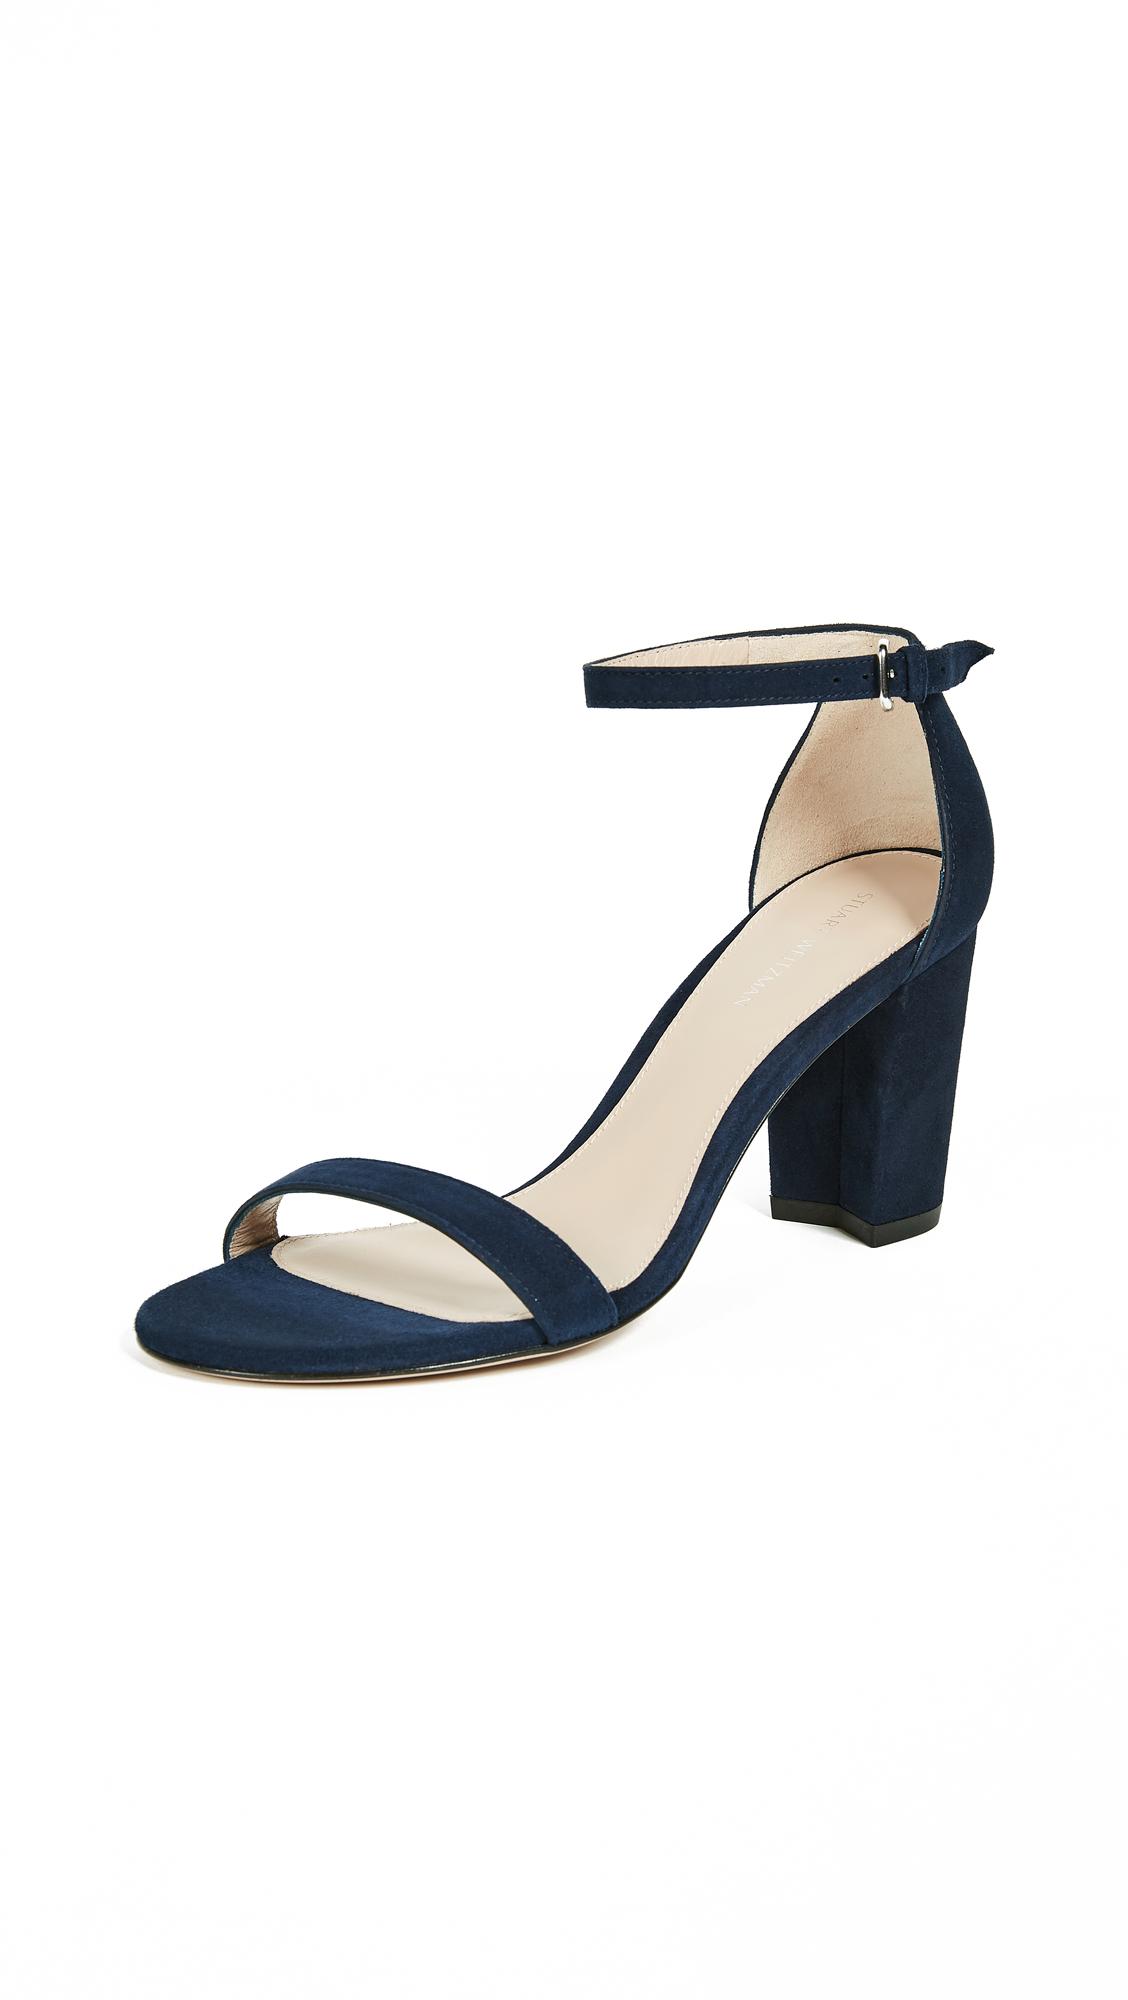 Stuart Weitzman Nearlynude Sandals - Nice Blue